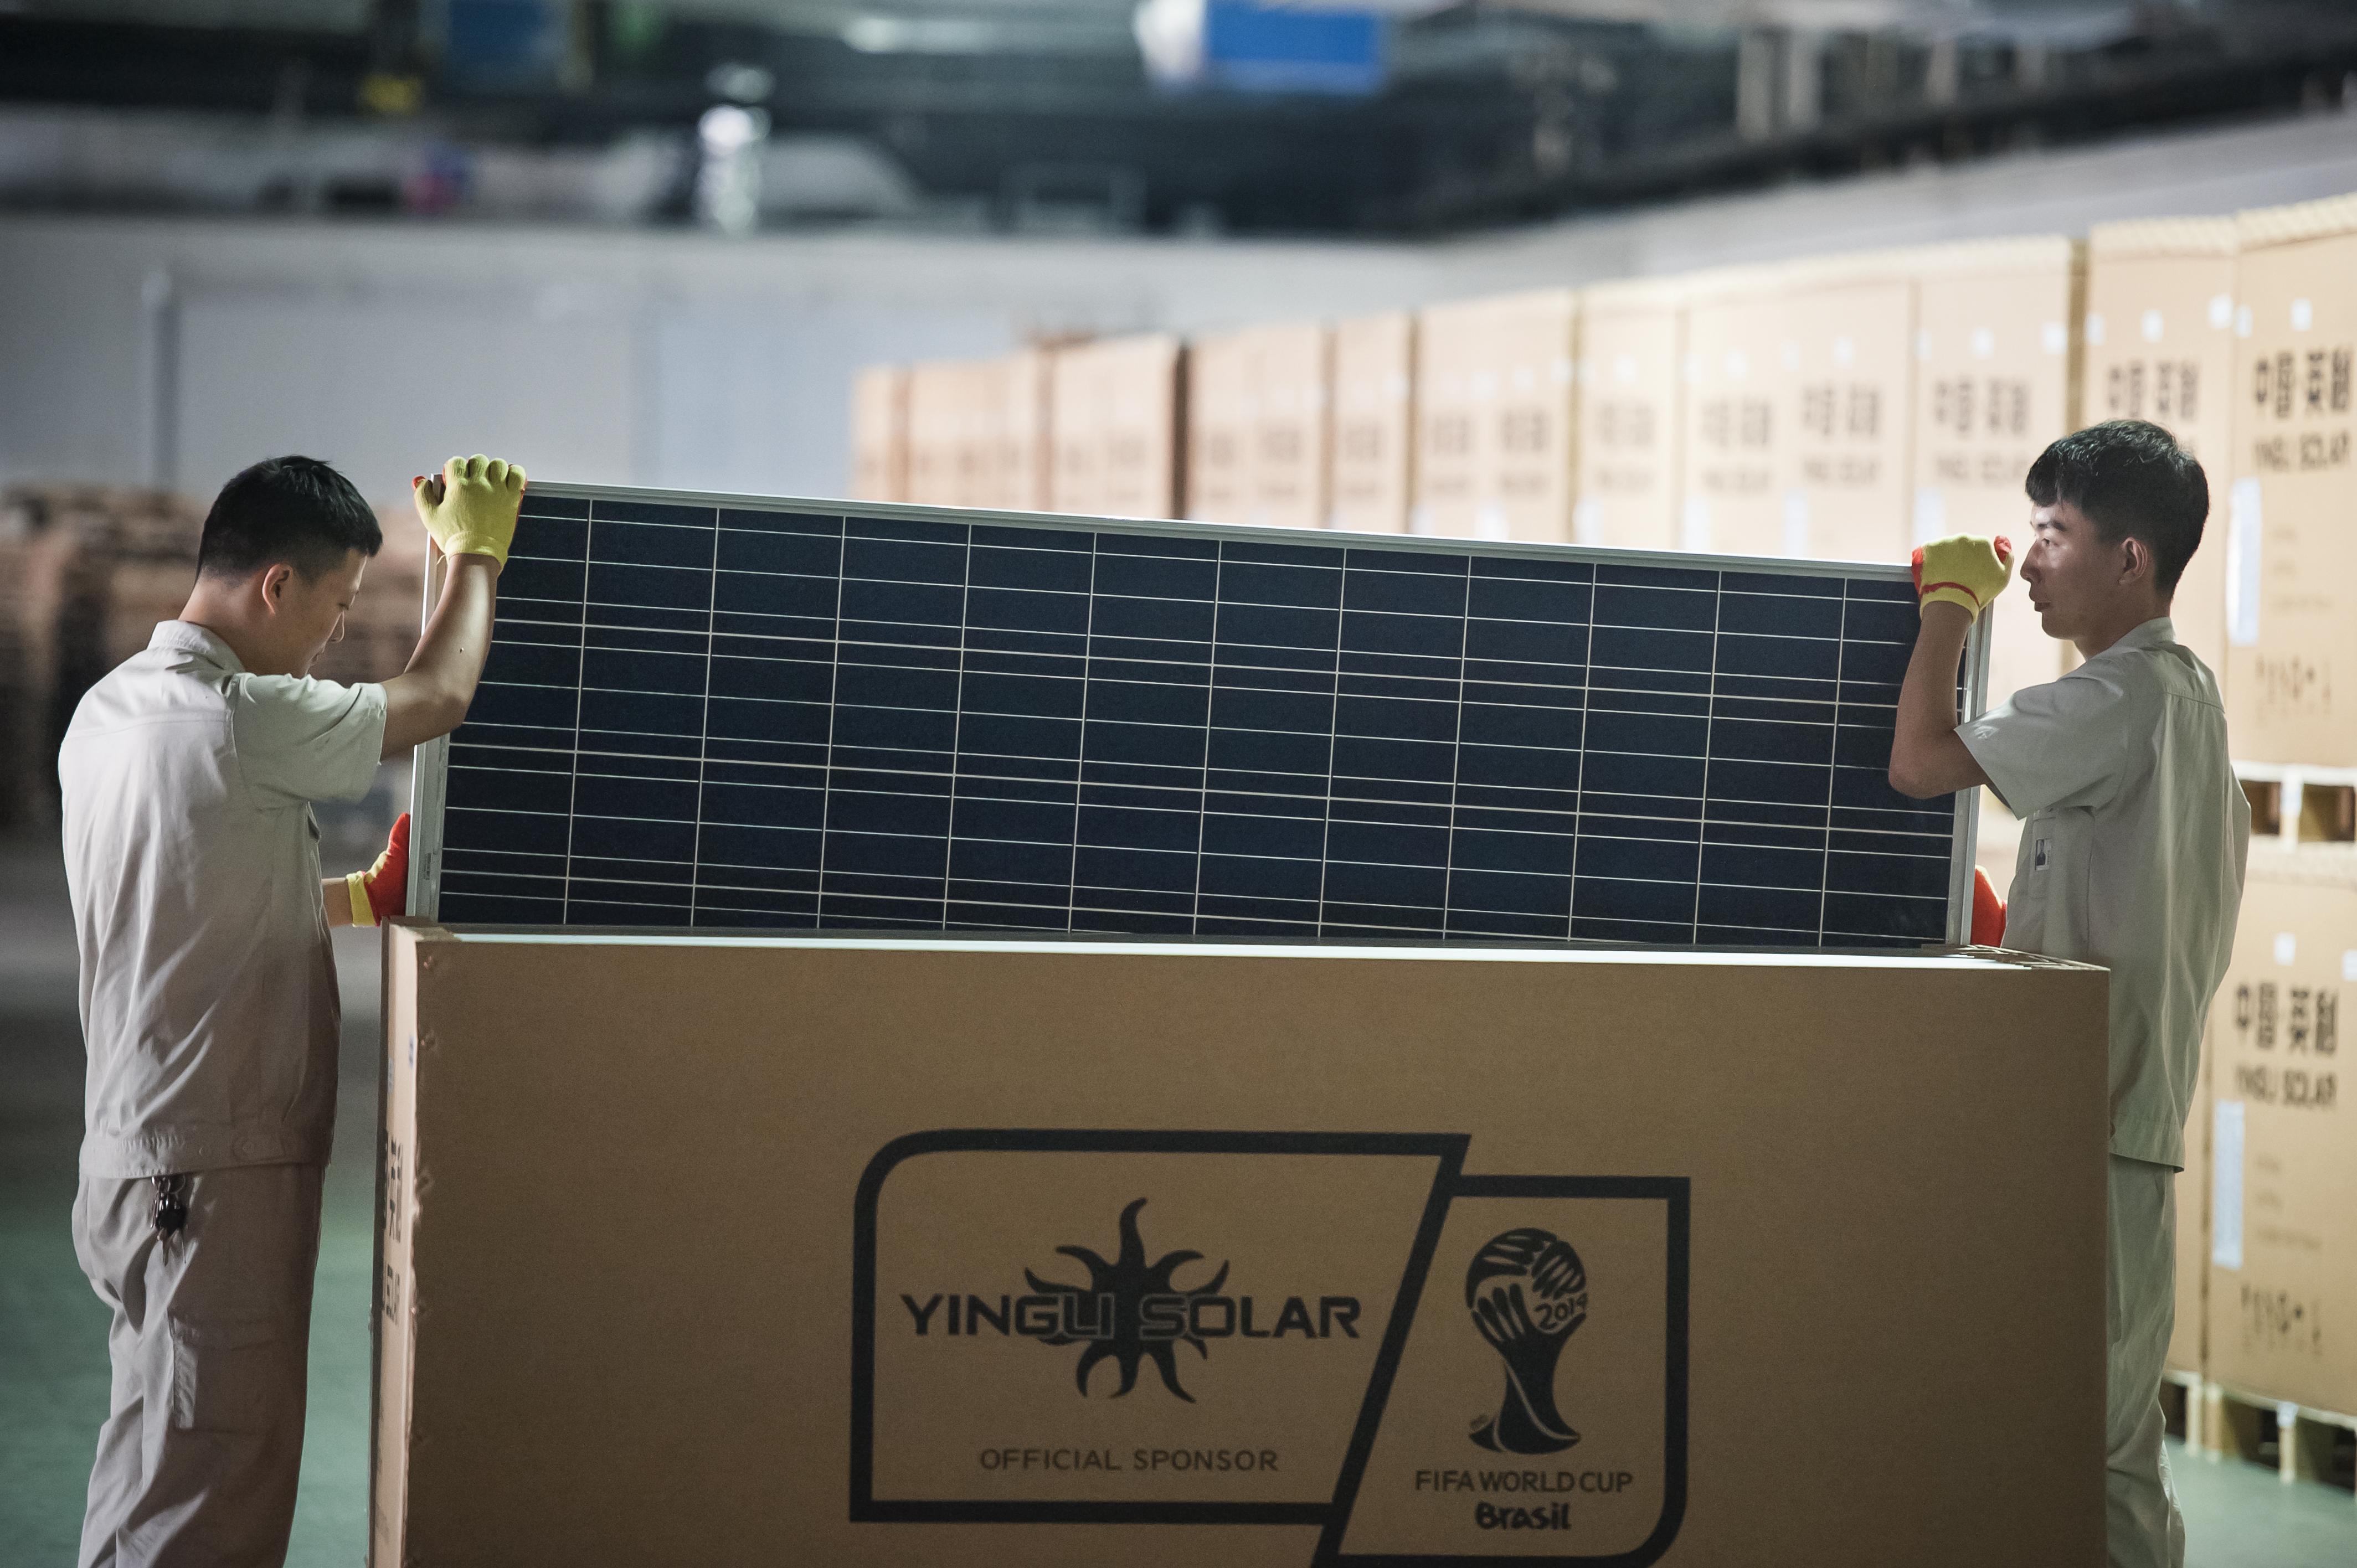 Panel Solar 325w